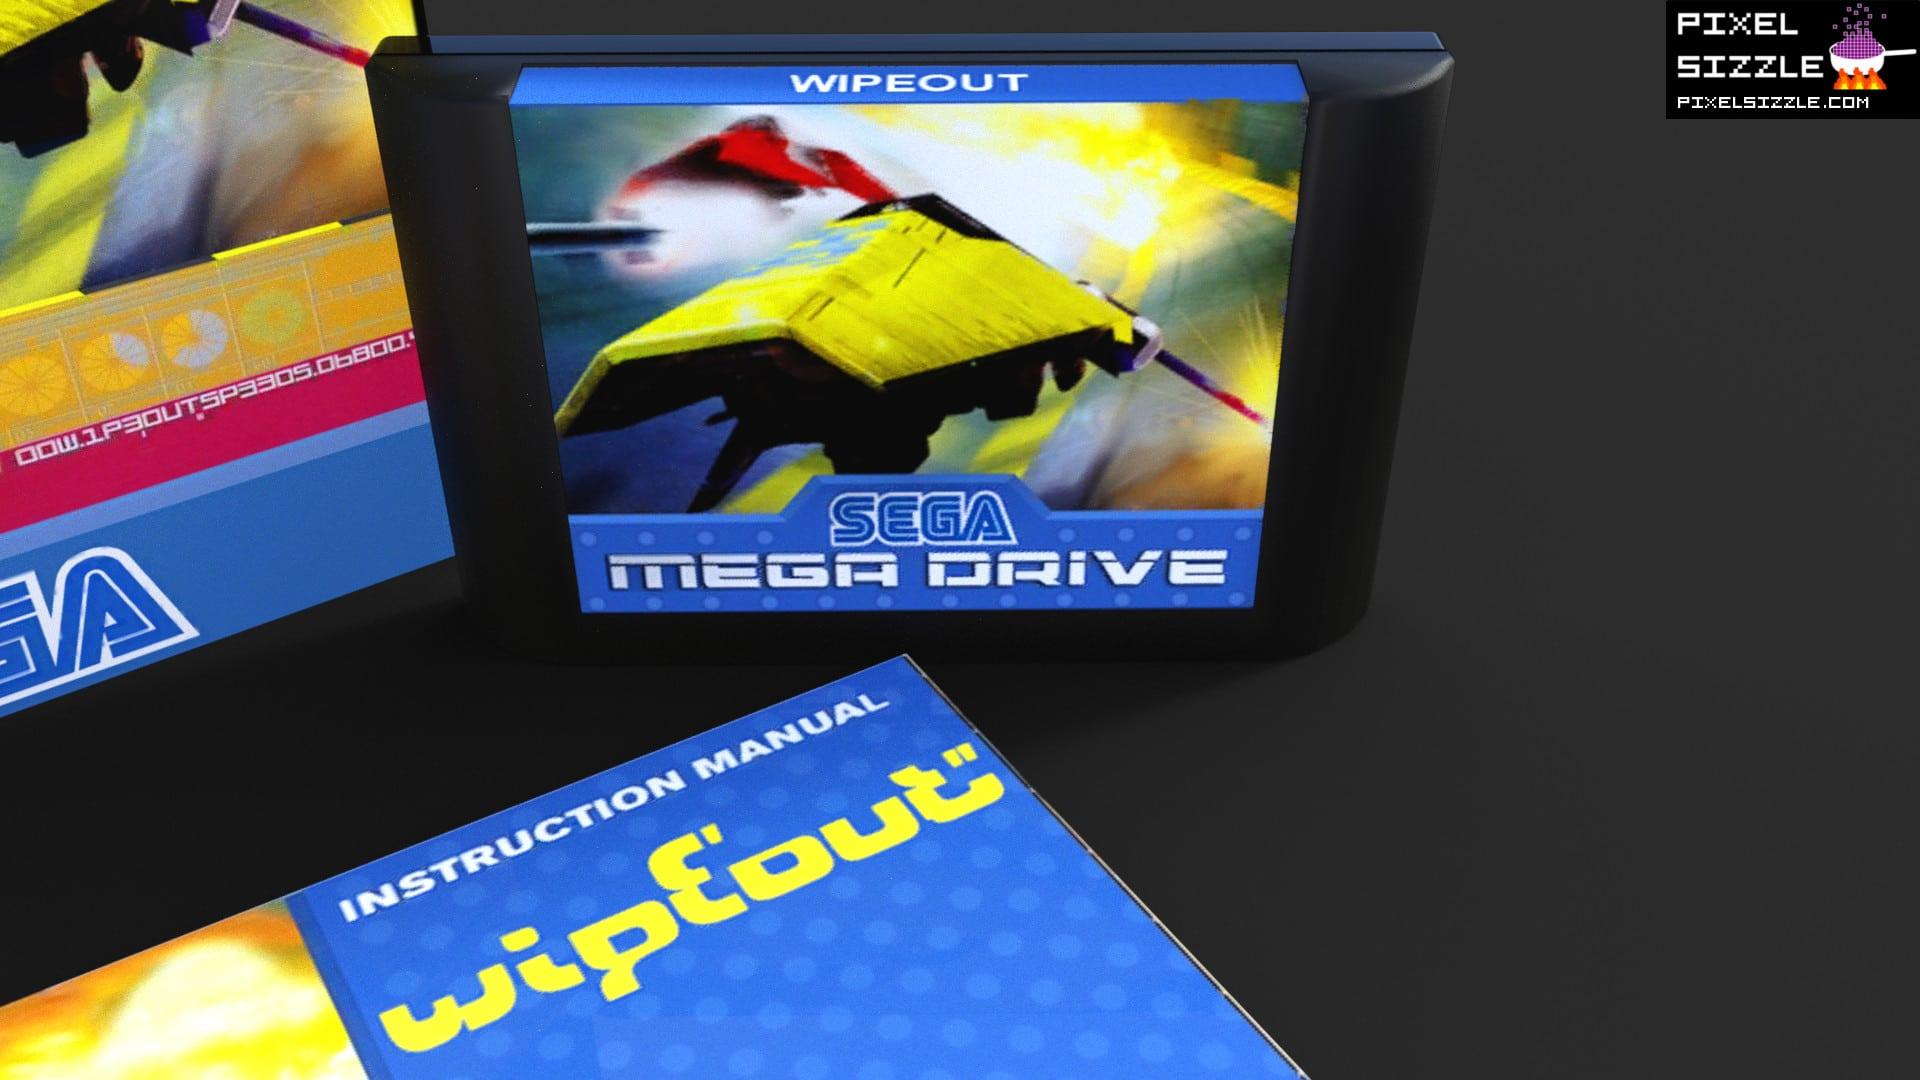 Retro Games. Wipeout. Sega Genesis